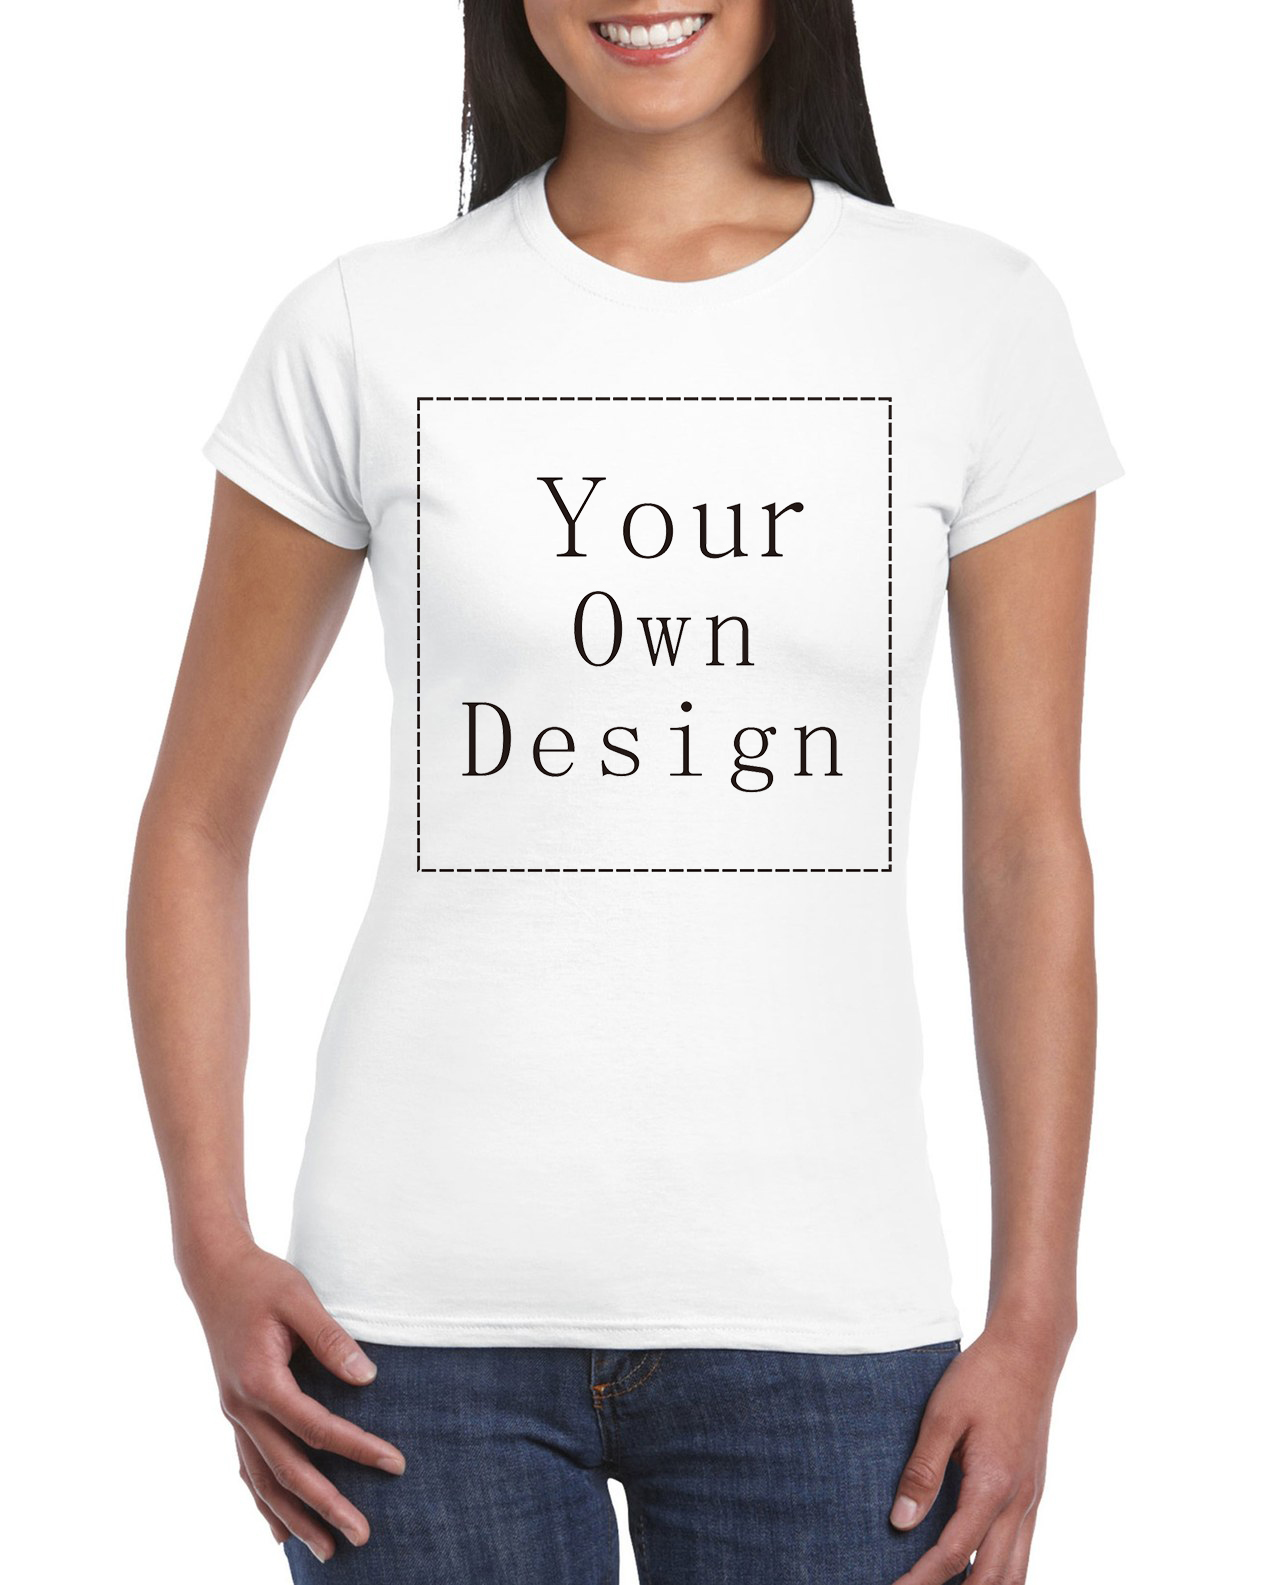 Design t shirt maker - Design T Shirt Maker 37